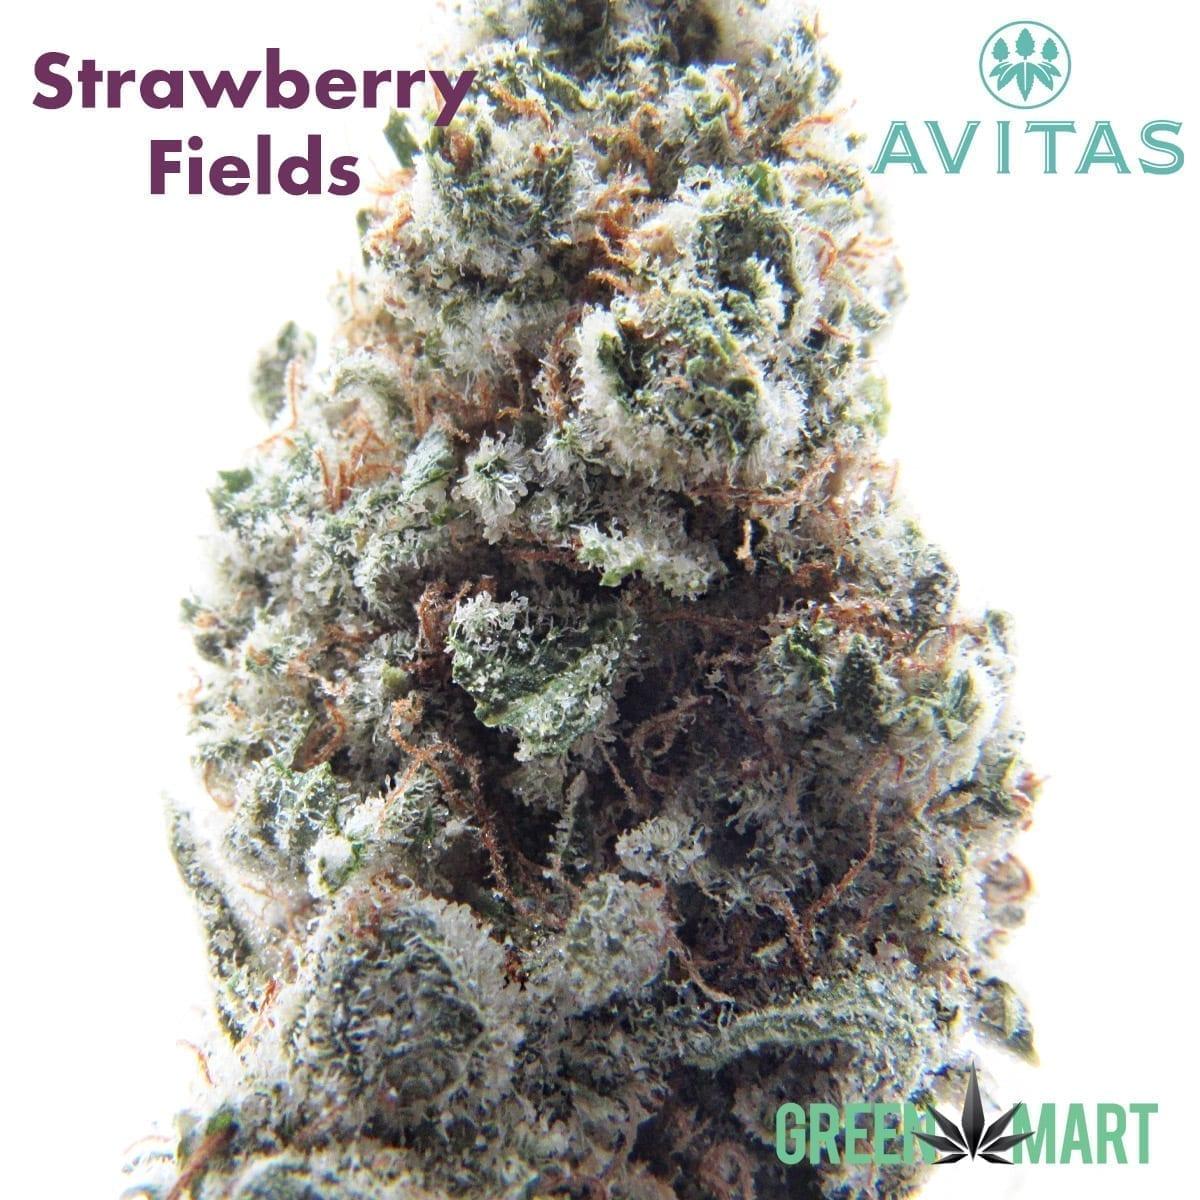 Strawberry Fields by Avitas